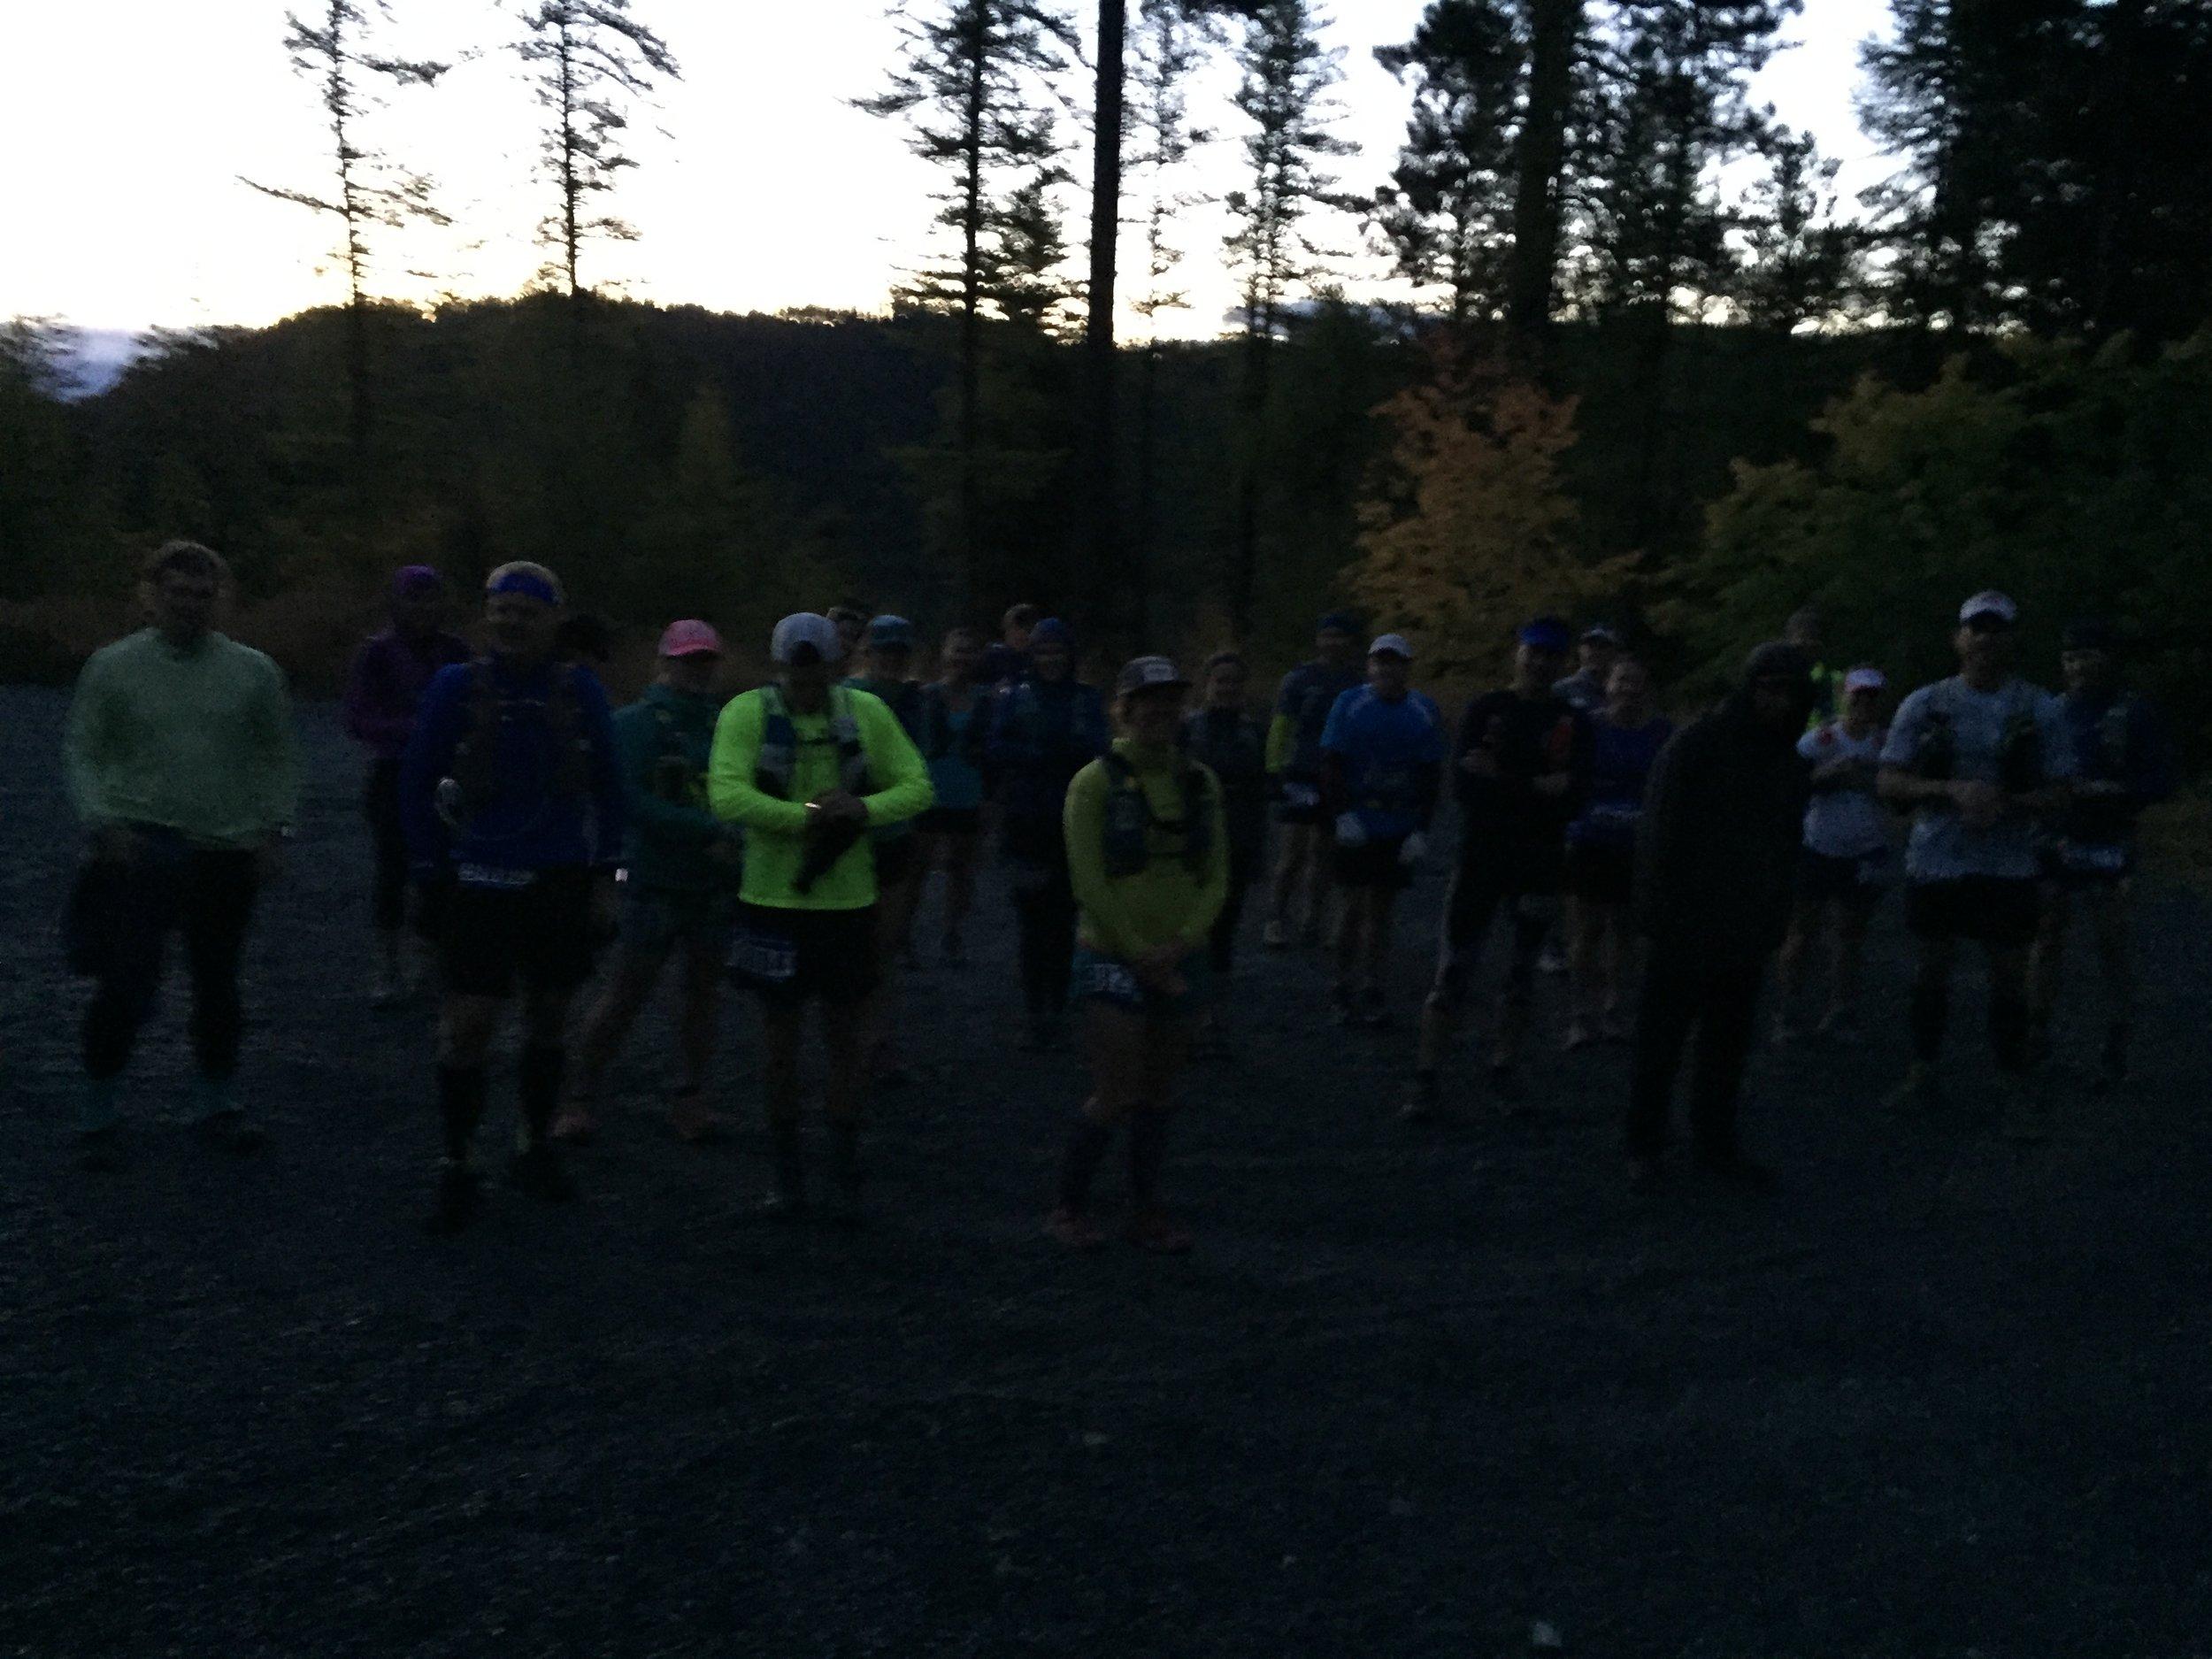 foys to blacktail trails trail marathon ftbtIMG_1035.JPG